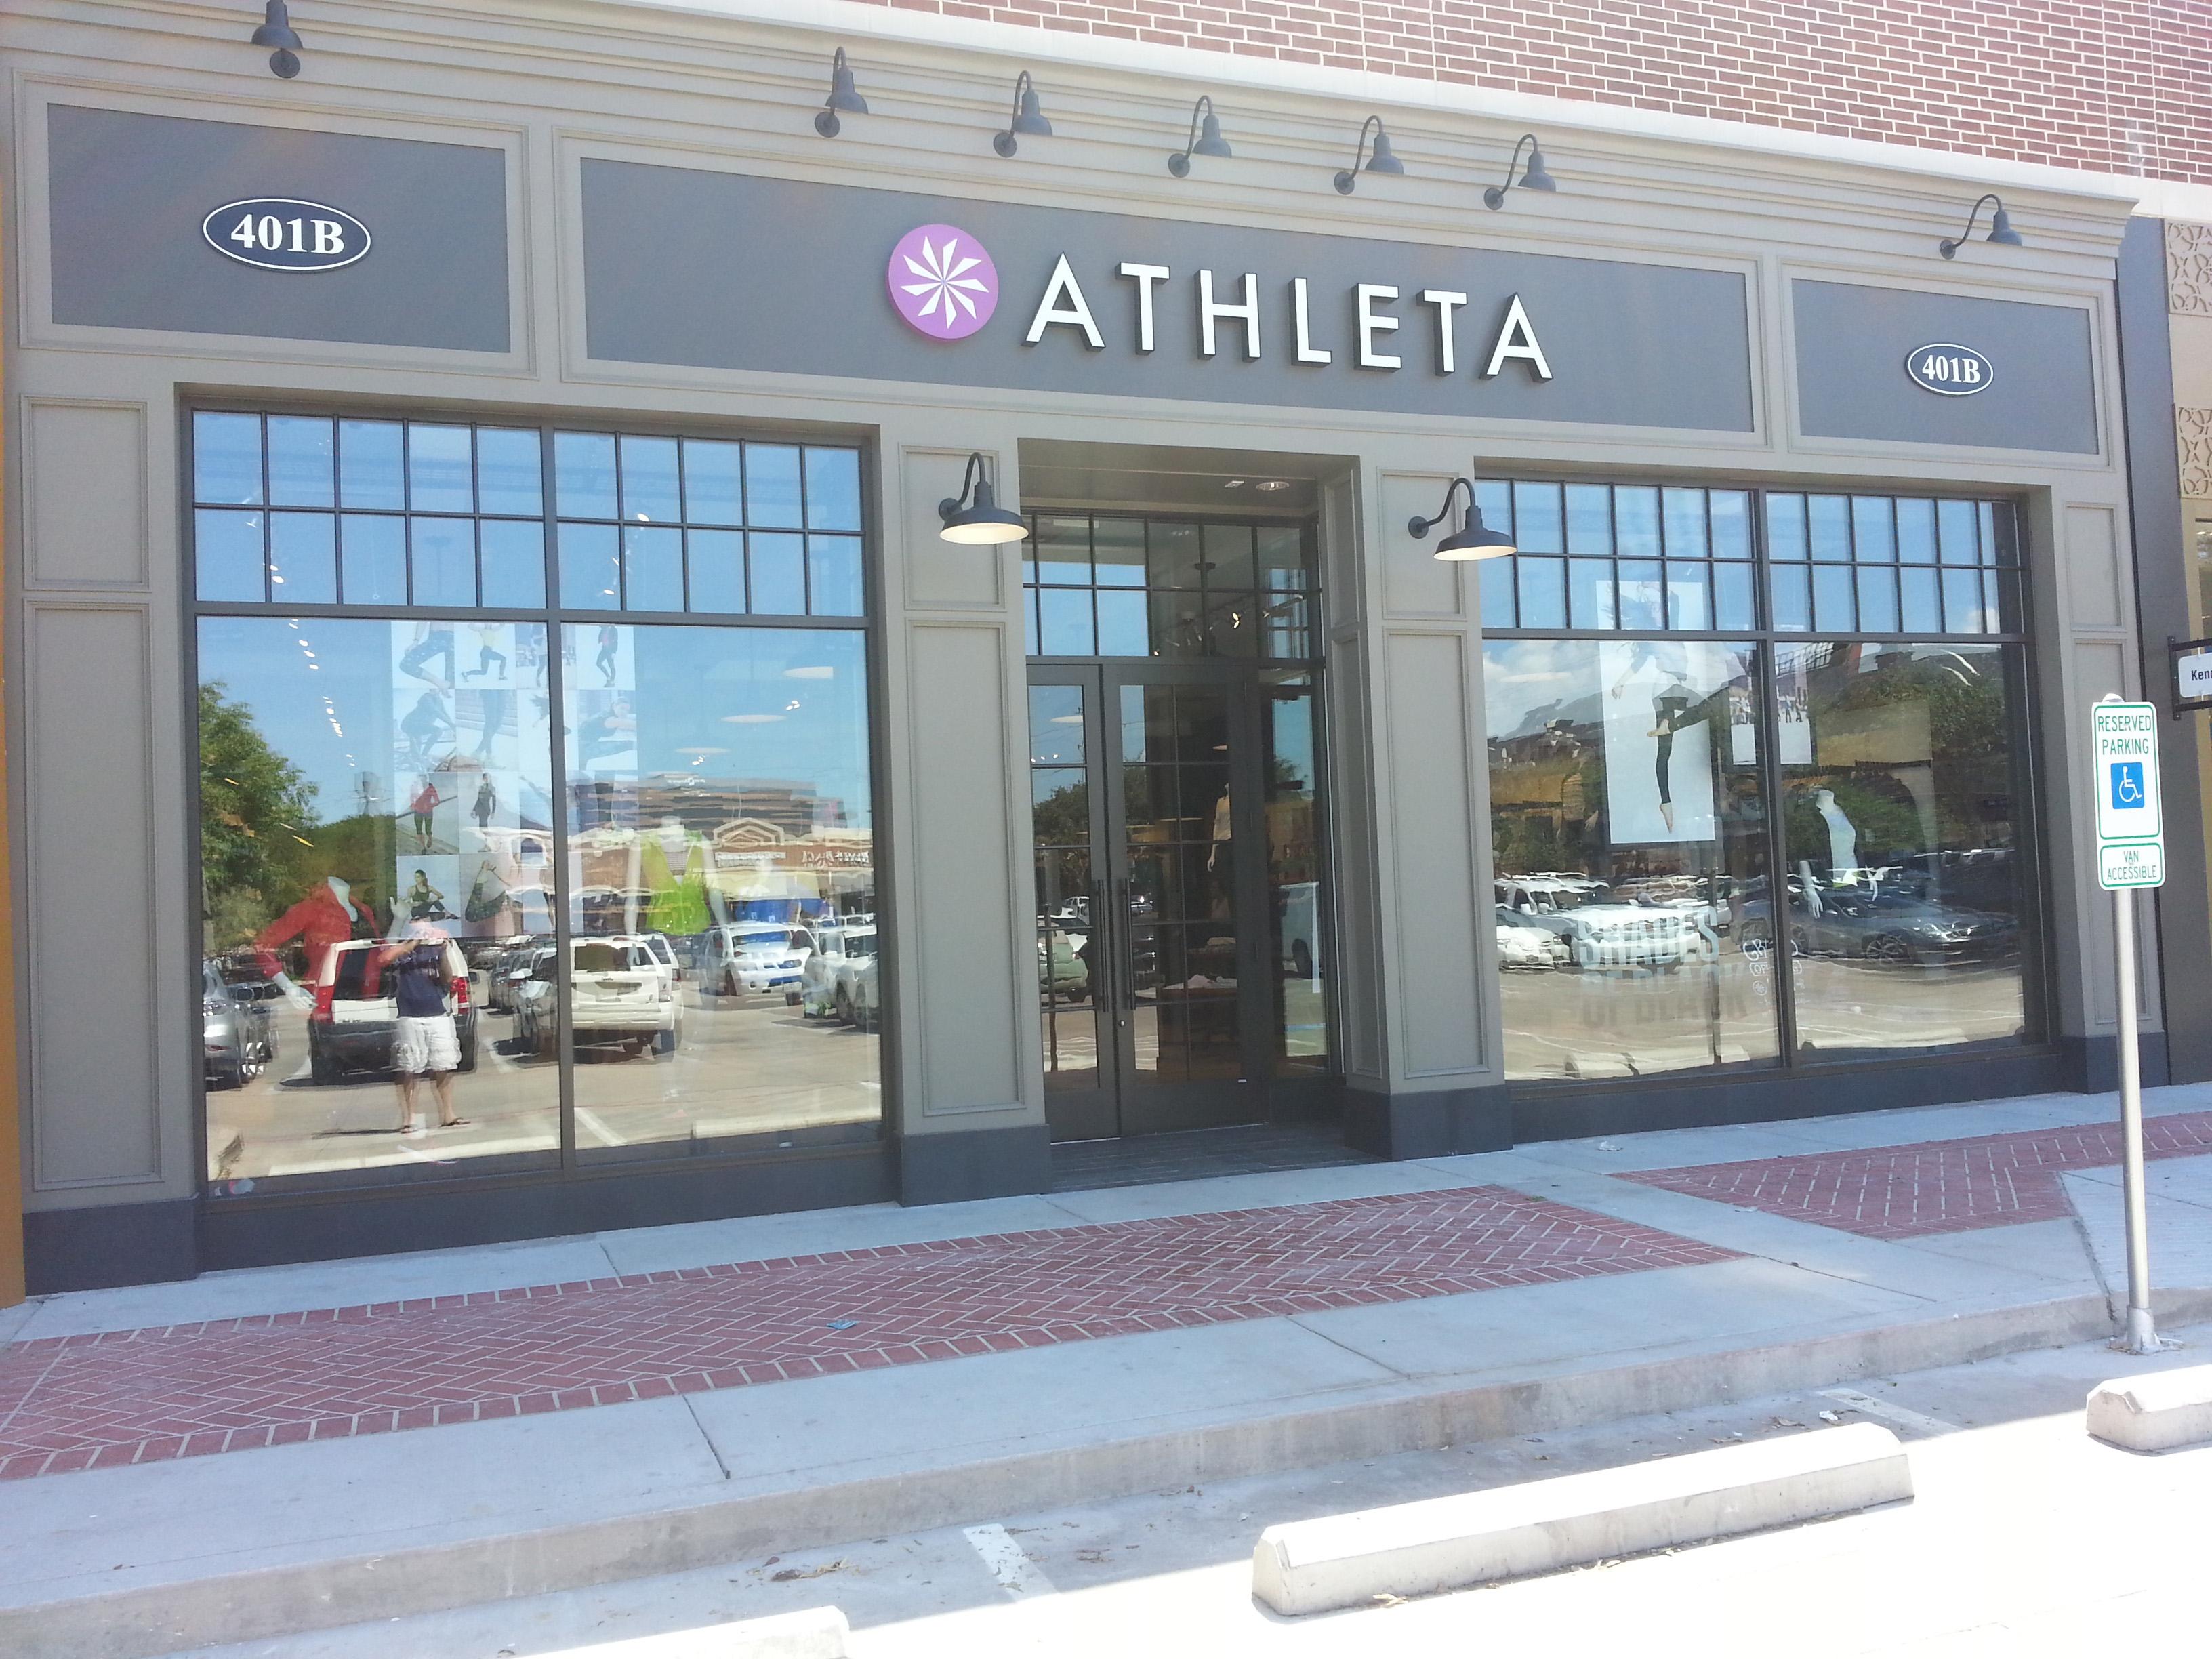 Reflective window film work for Athleta